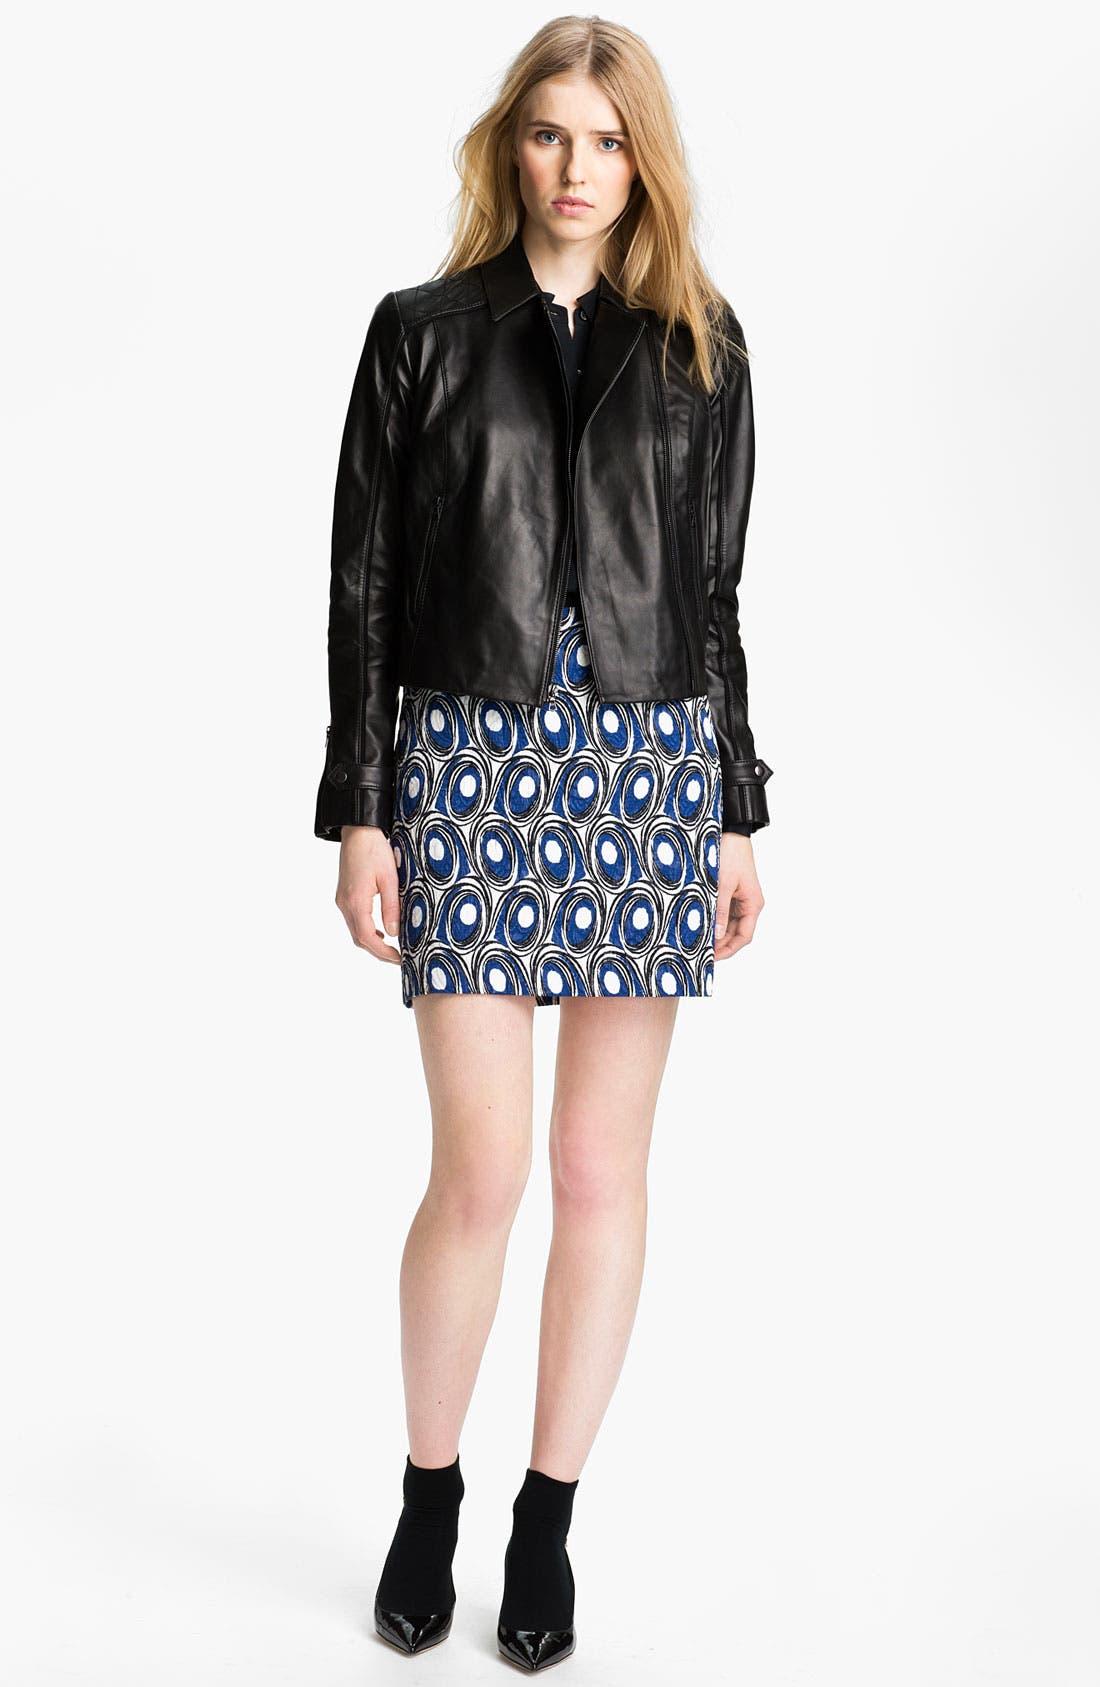 Alternate Image 1 Selected - Miss Wu Leather Biker Jacket (Nordstrom Exclusive)